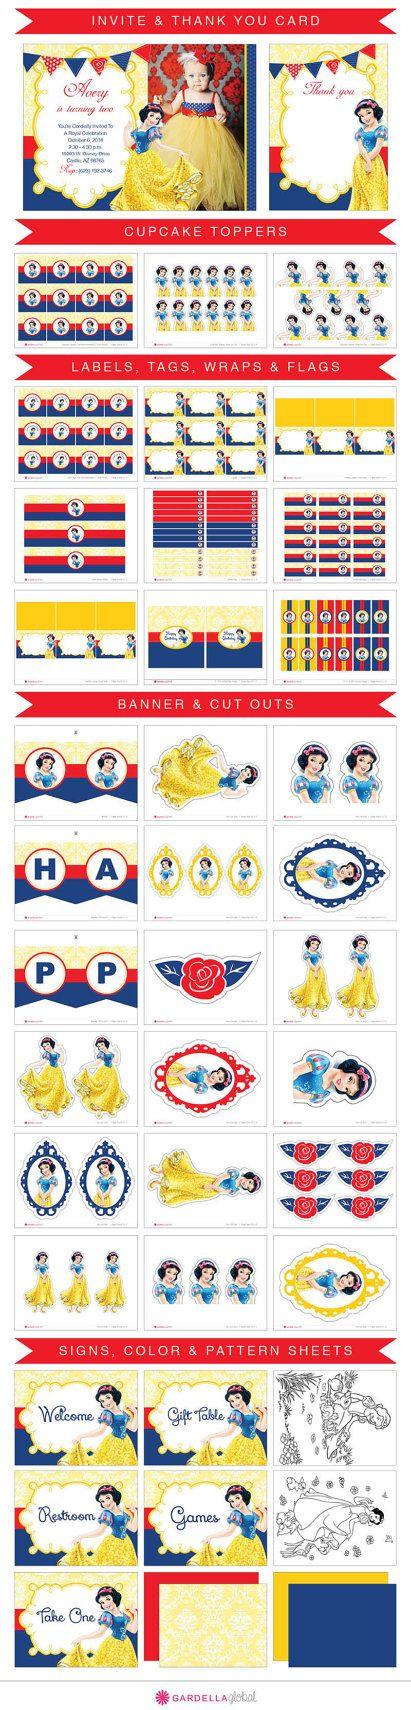 Snow White Invitation, Snow White Invite, Disney Princess Invitation, Disney…